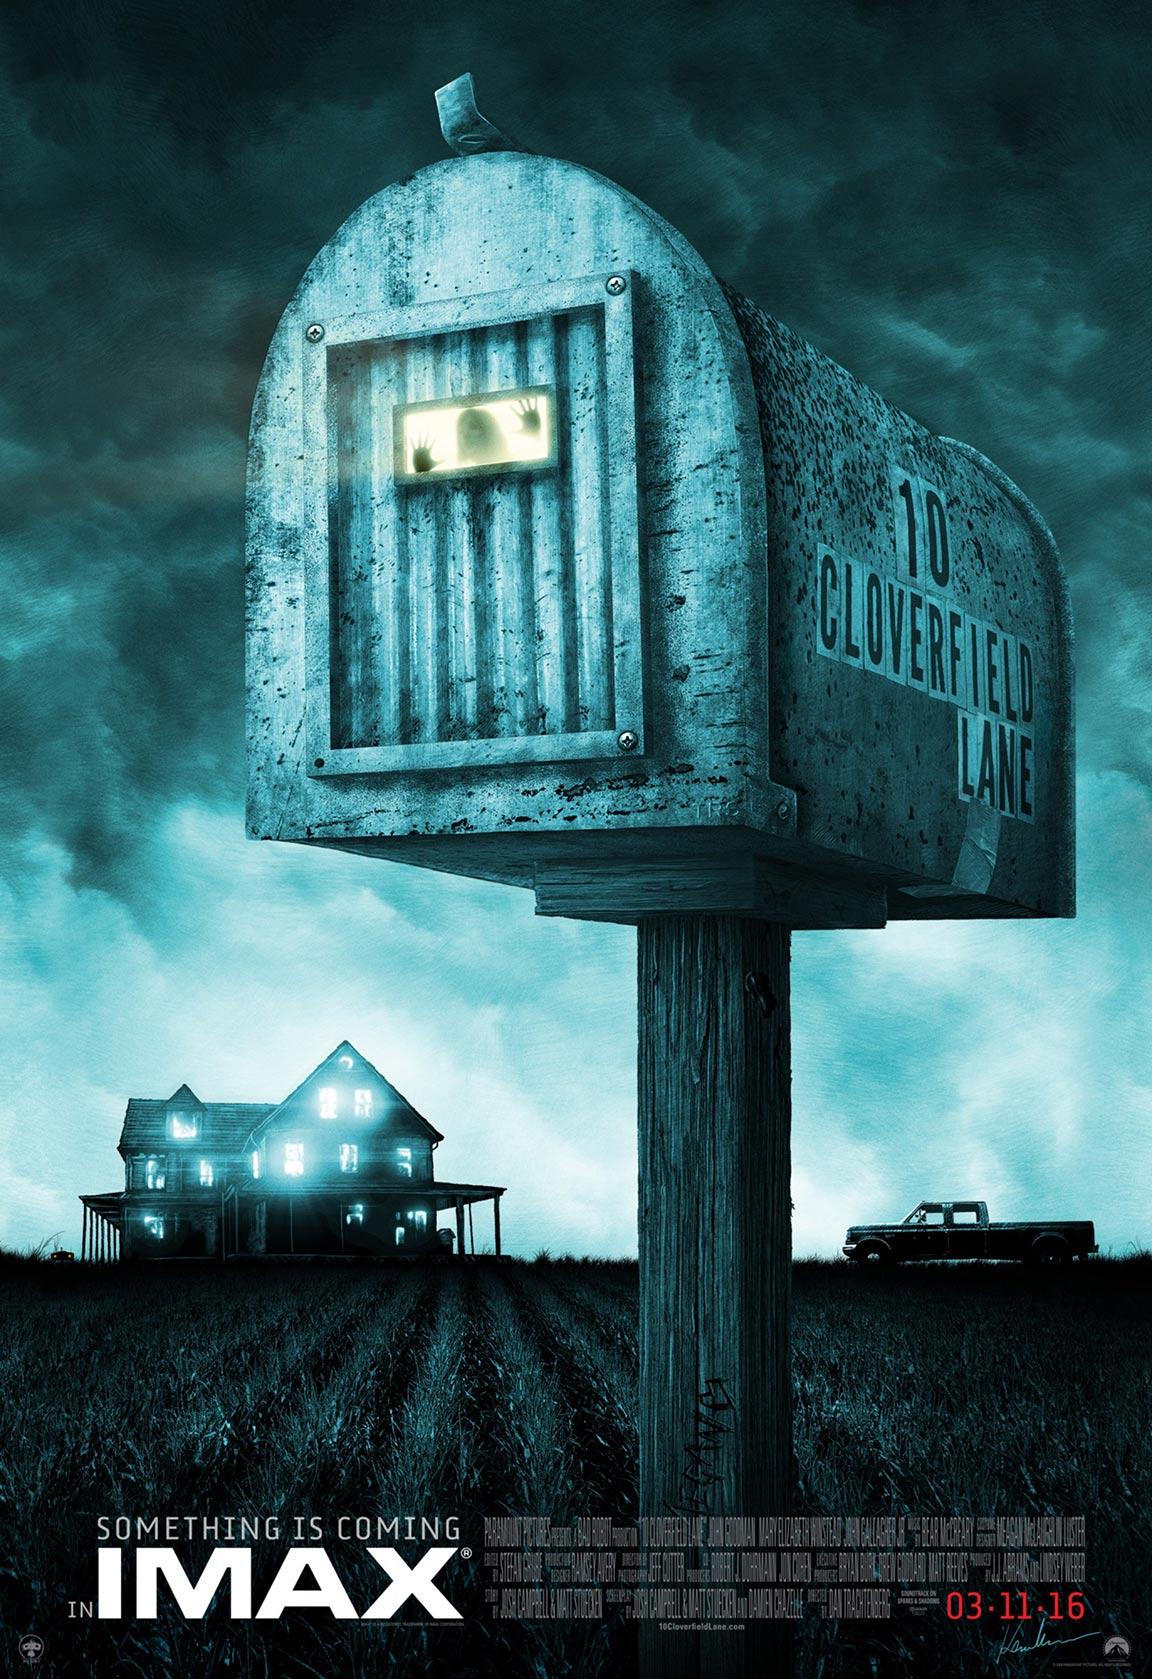 Download 10 Cloverfield Lane 2016 movie free - LindyMax